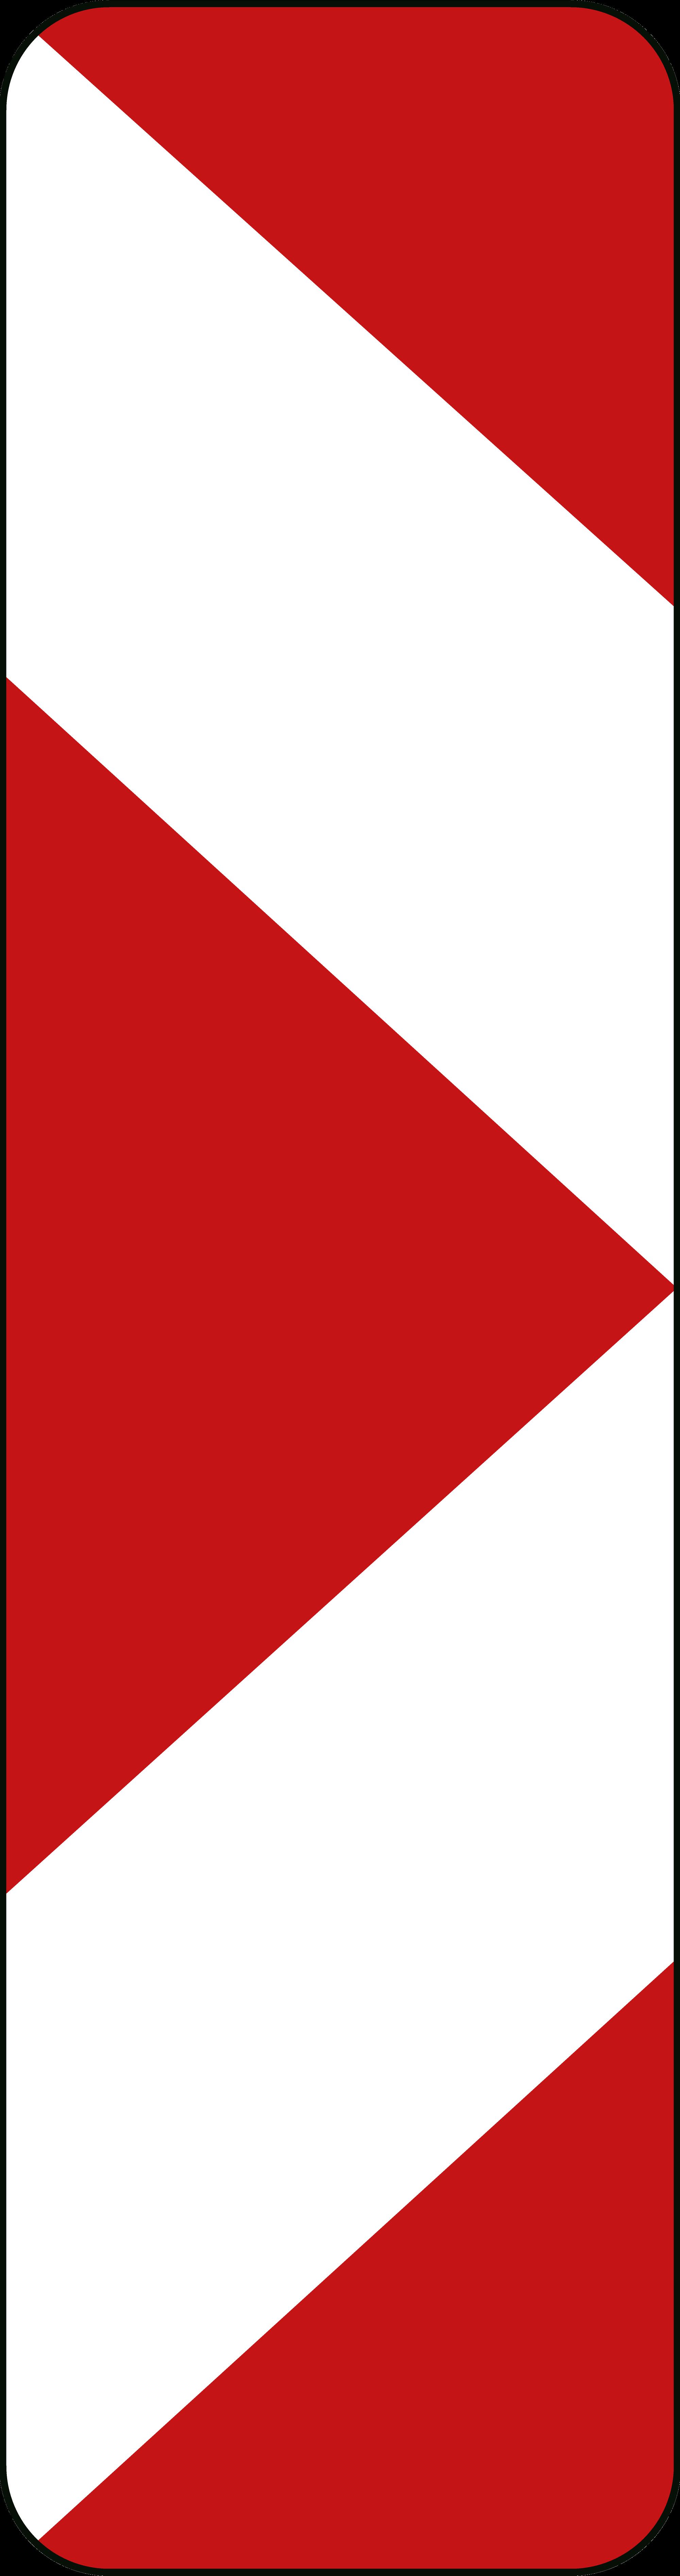 Signface - TIb2 - klasse  I - 300/1100 mm